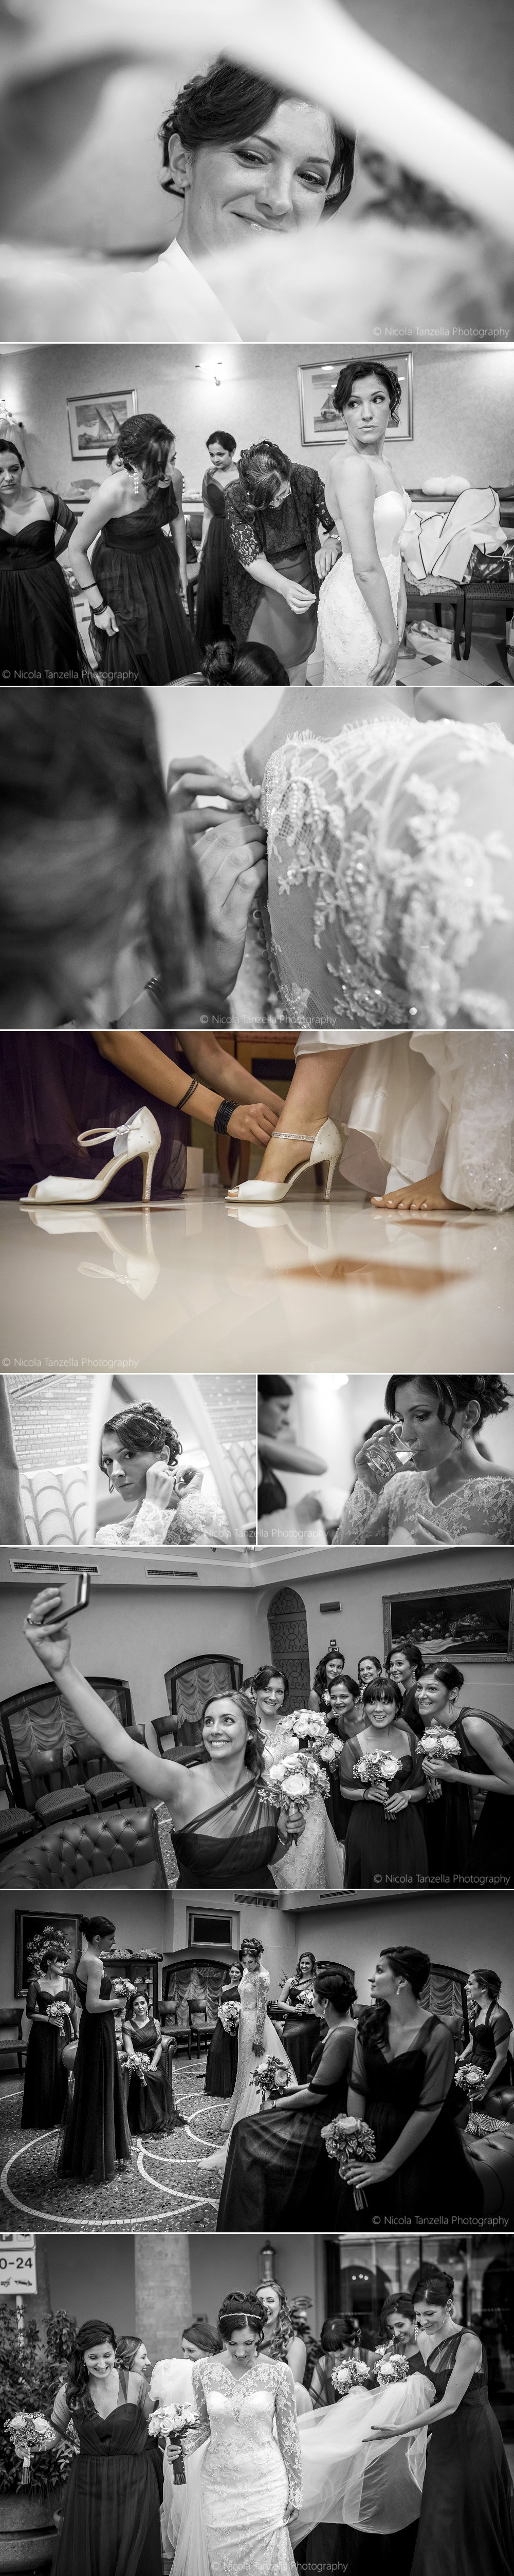 fotografo matrimonio modena -003